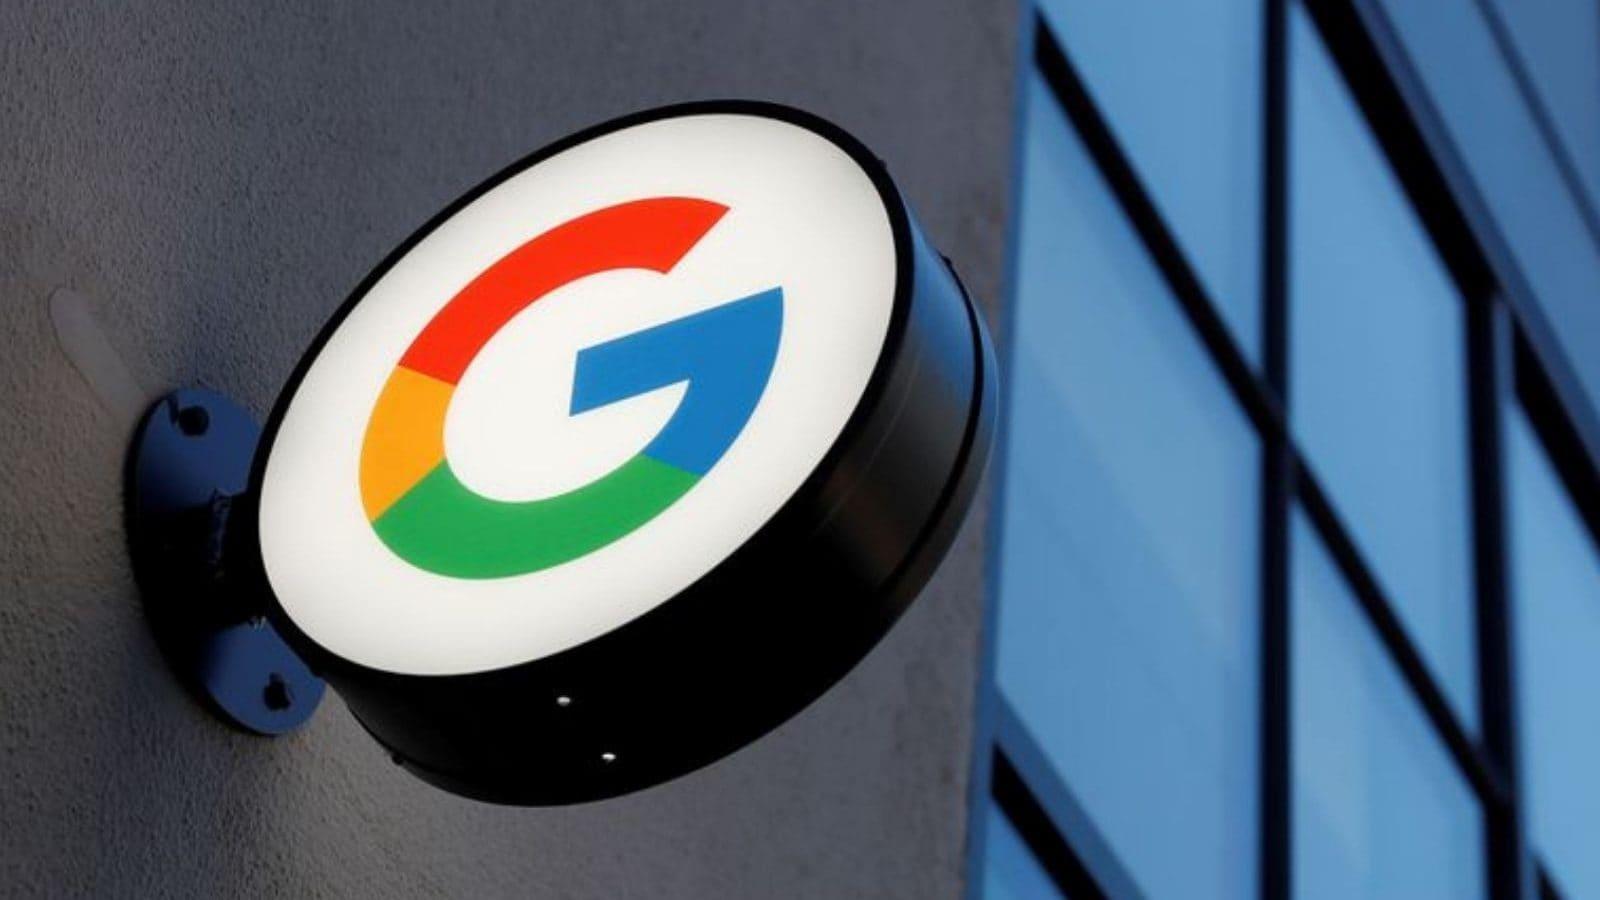 Google's Parent Alphabet to Launch Robotics Firm Intrinsic